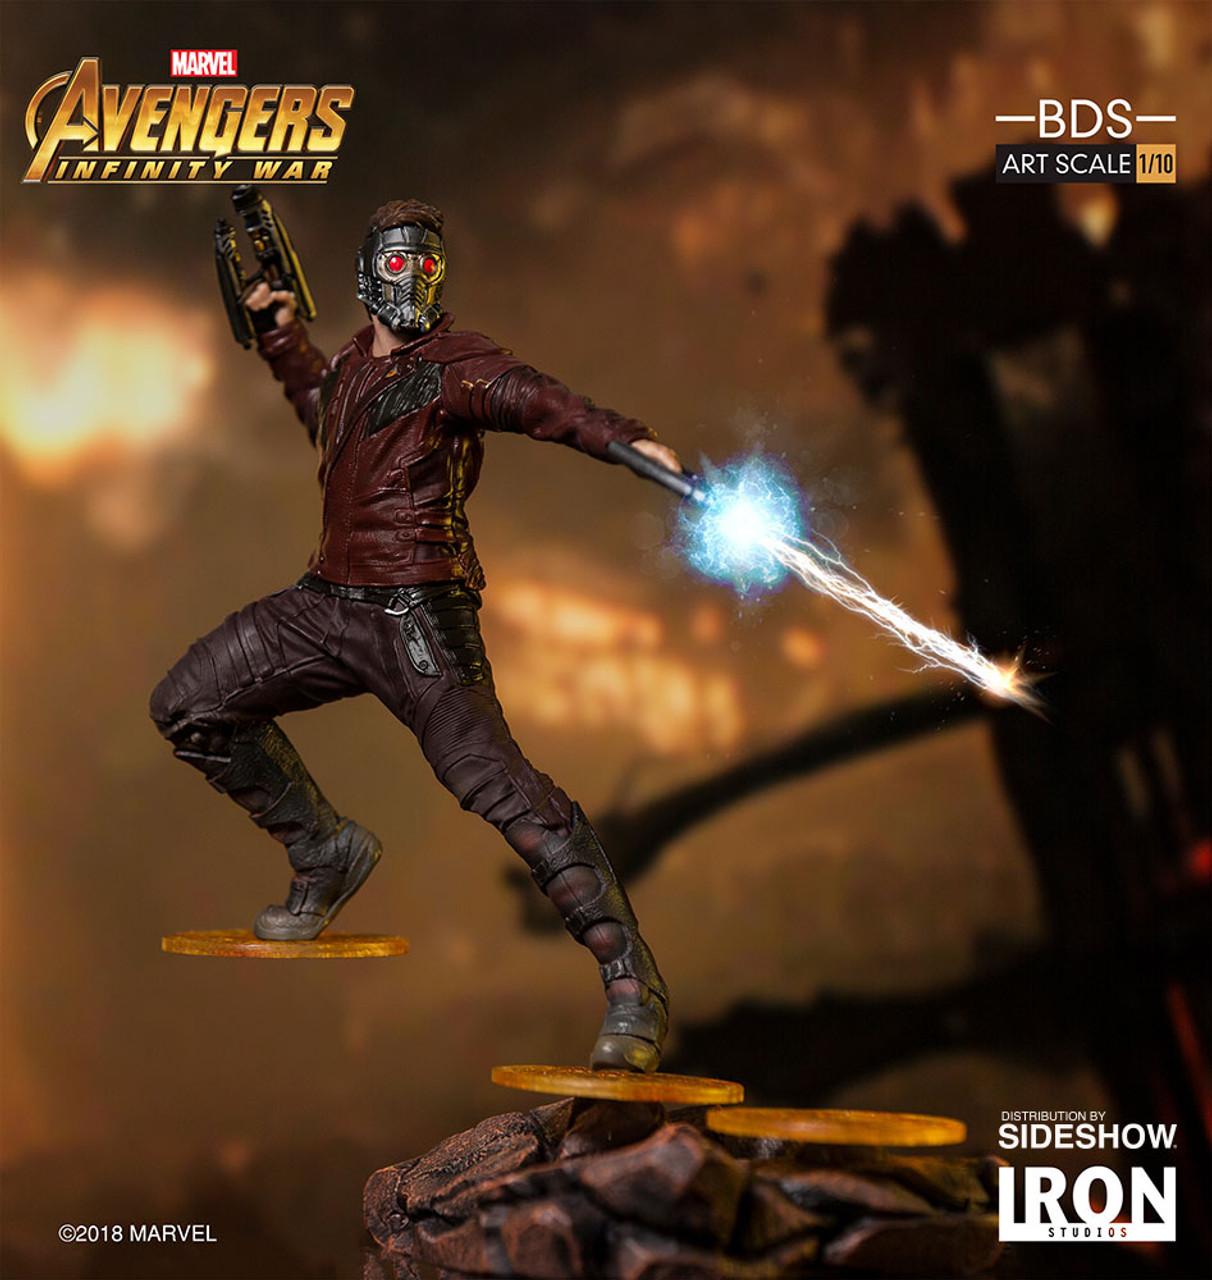 marvel star lord statue by iron studios avengers infinity war battle diorama series art scale 1 10 base figurine